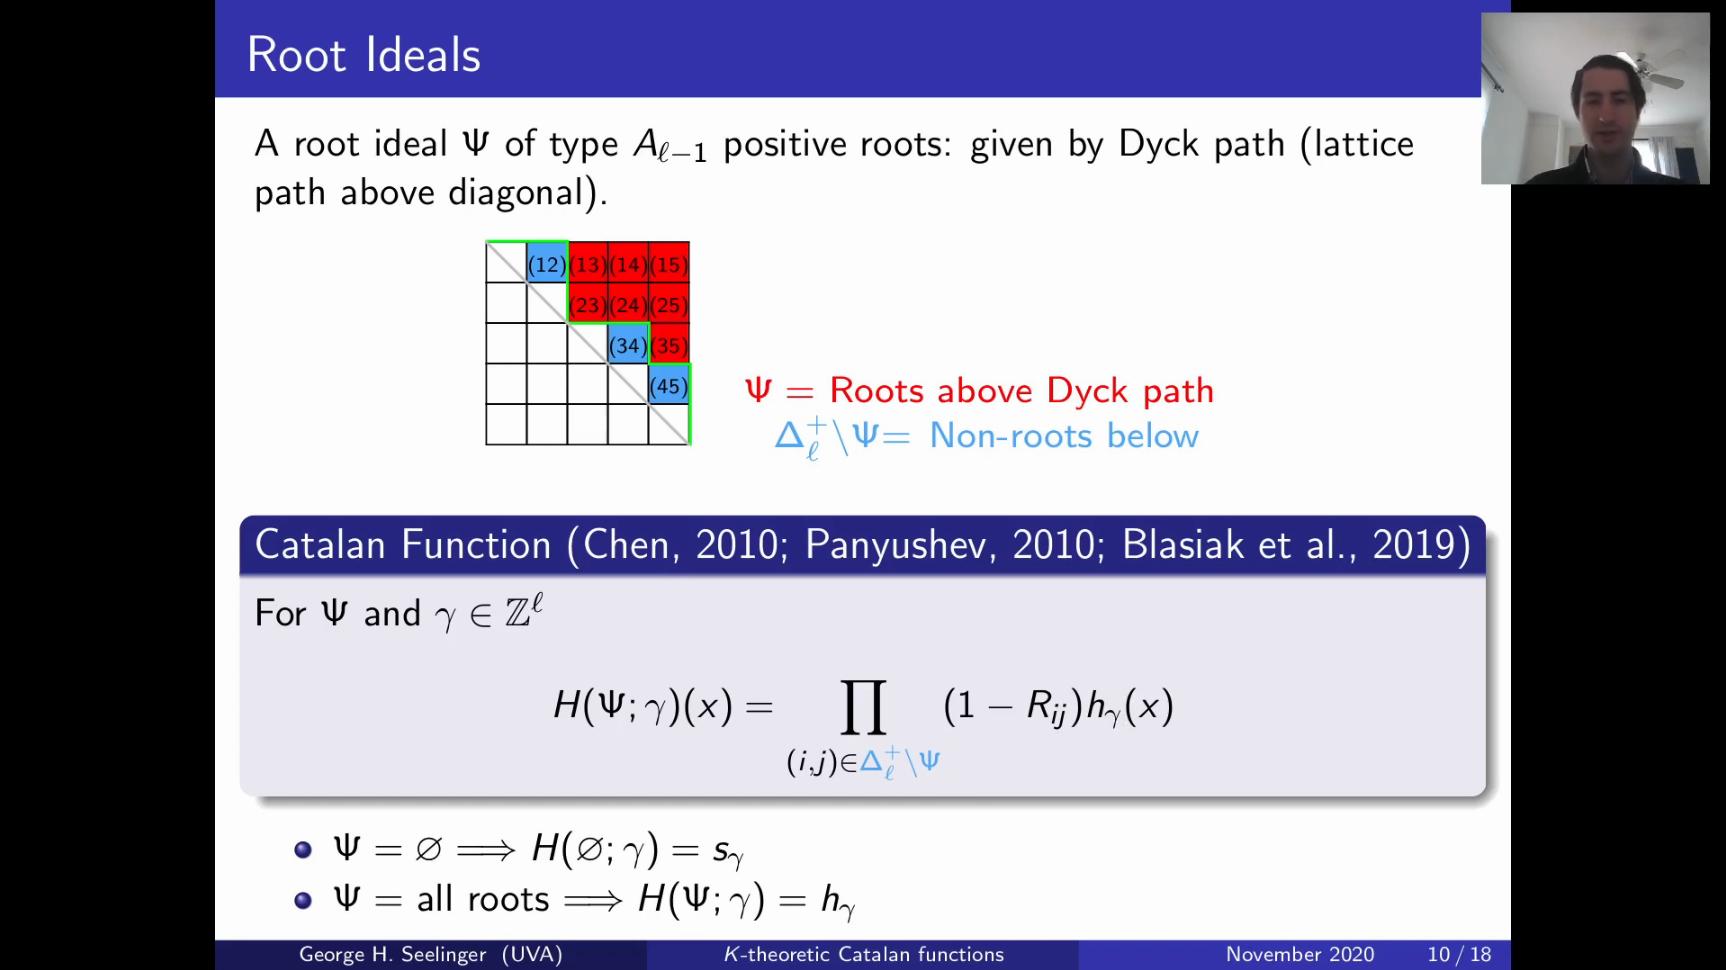 A screenshot of the presentation